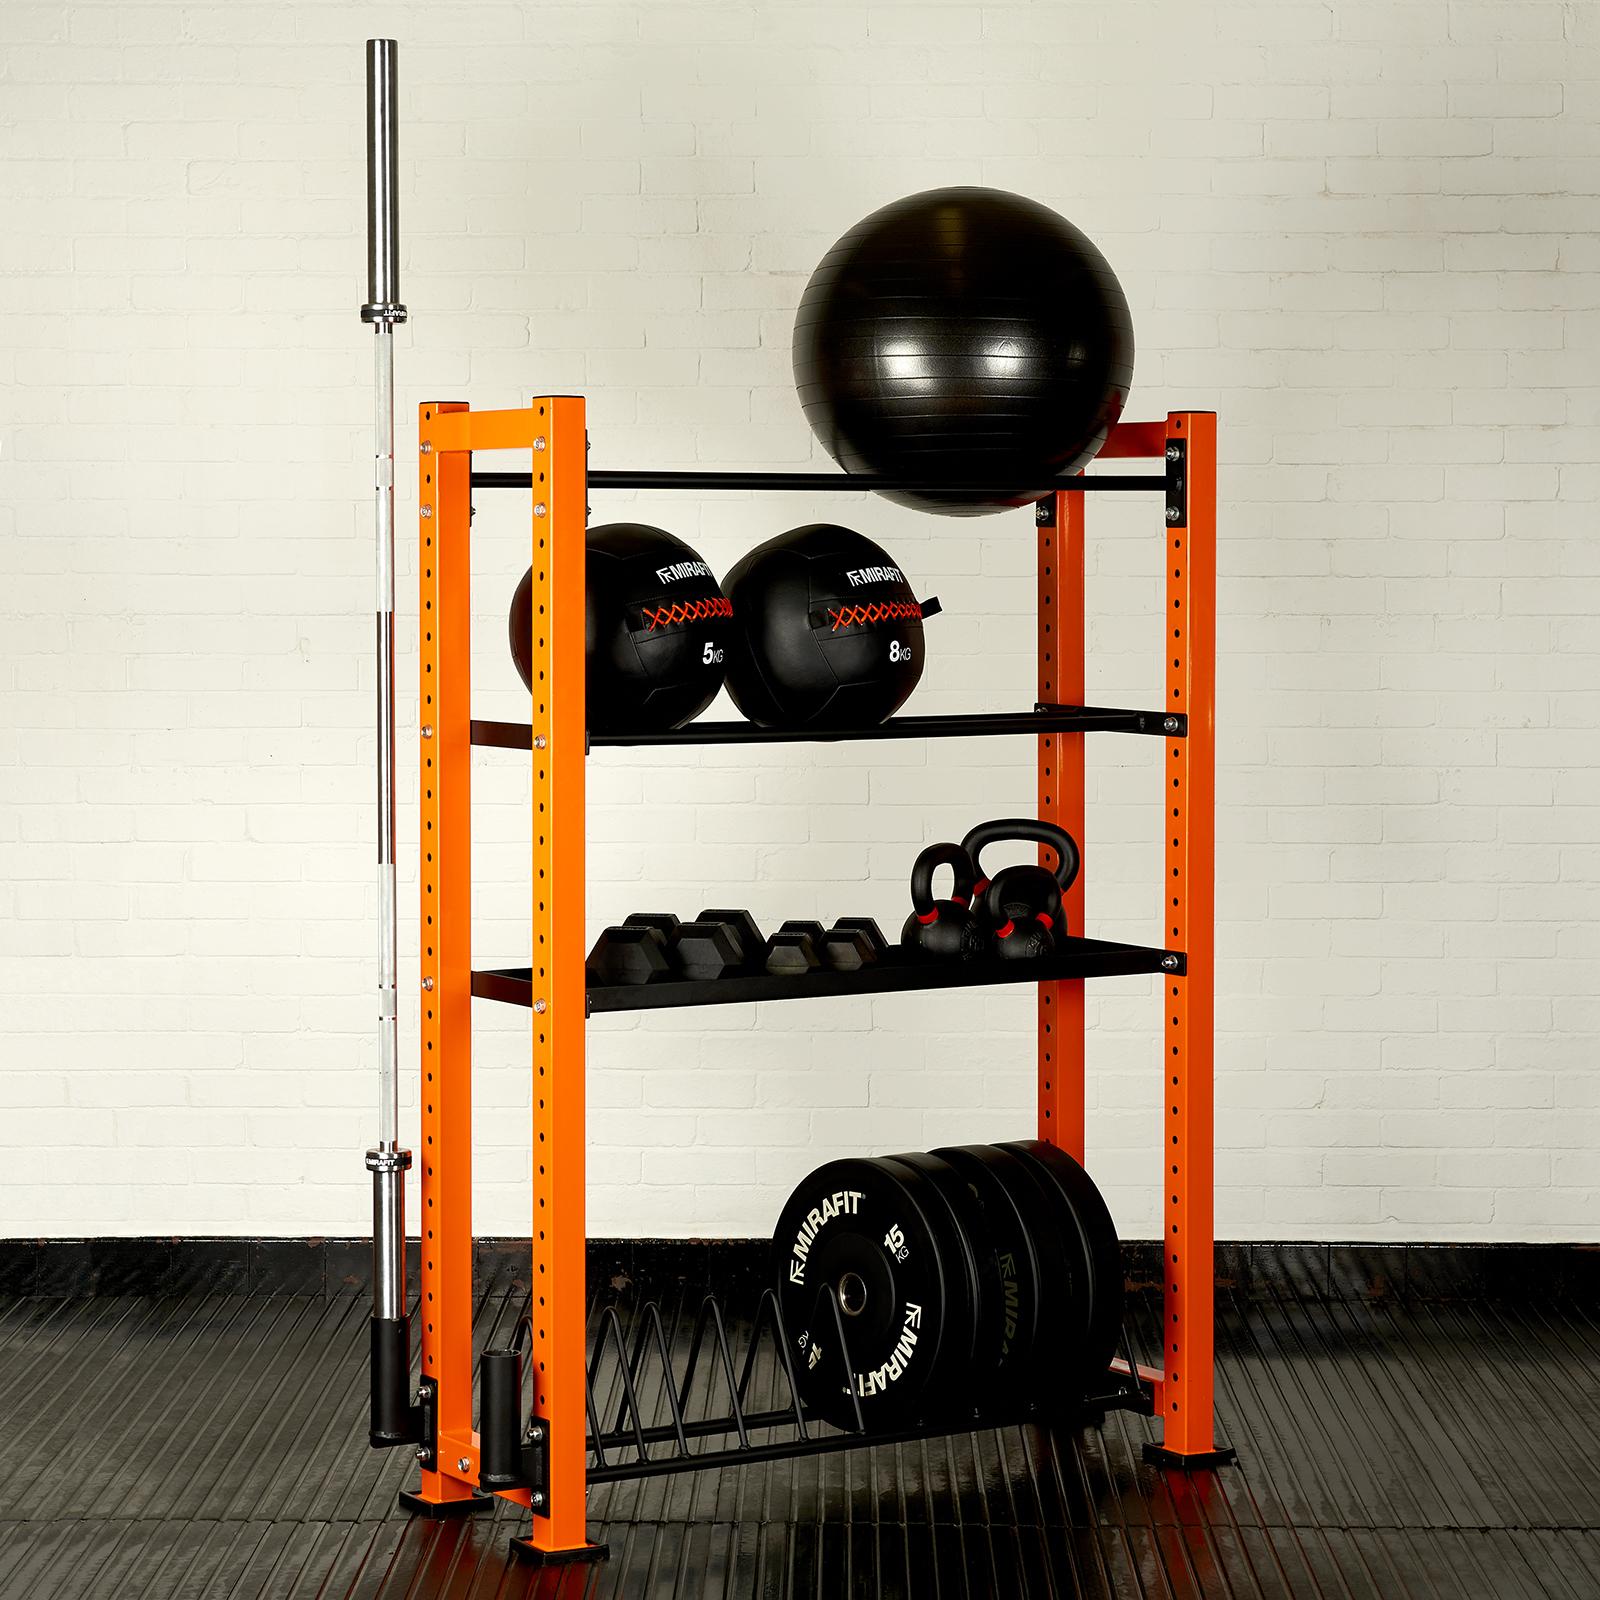 Sentinel Mirafit Gym Equipment Storage Bay Bumper Plate Weight Bar  Kettlebell Rack Stand